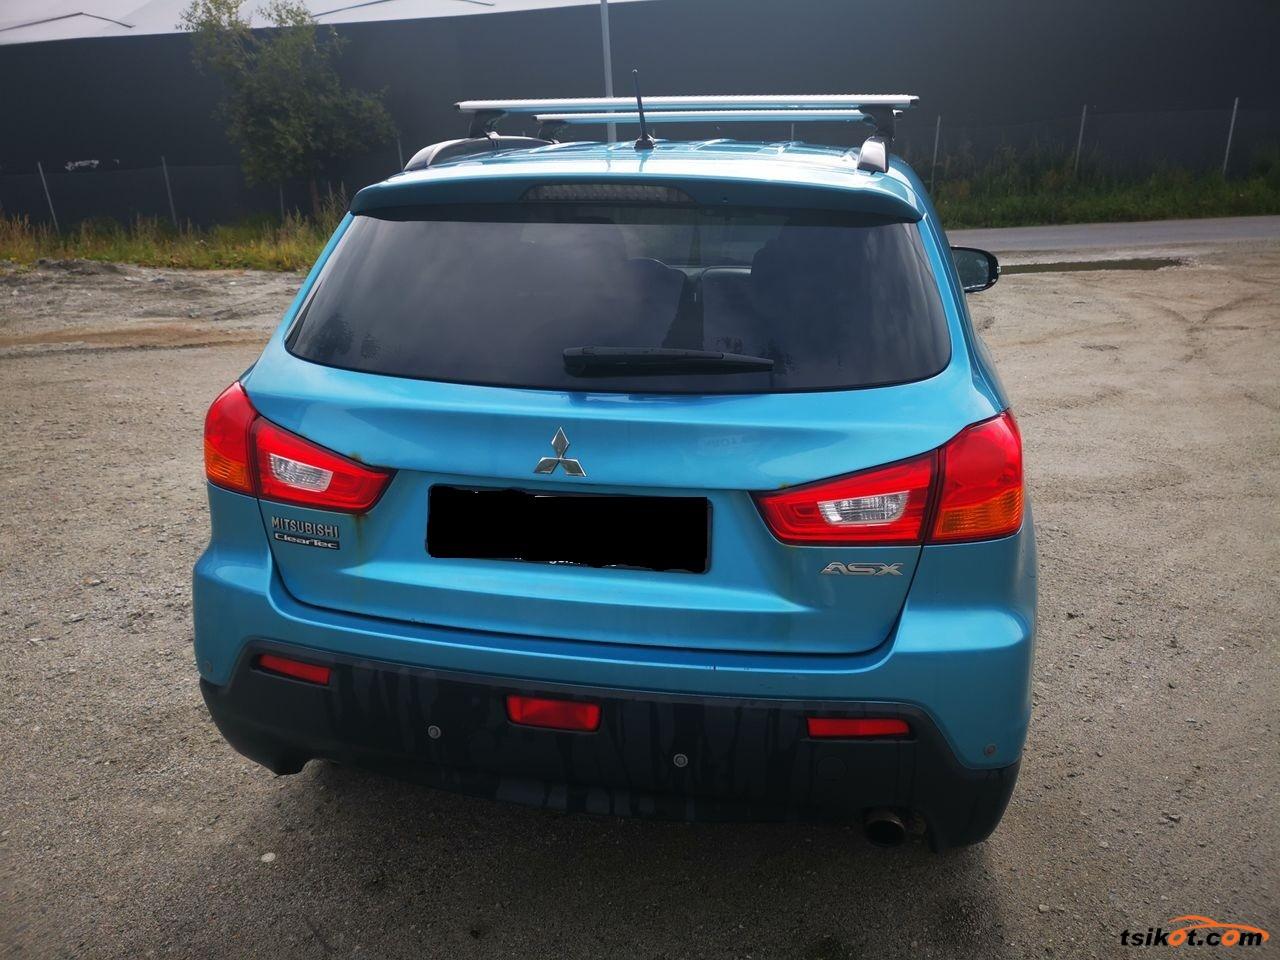 Mitsubishi Asx 2011 - 6